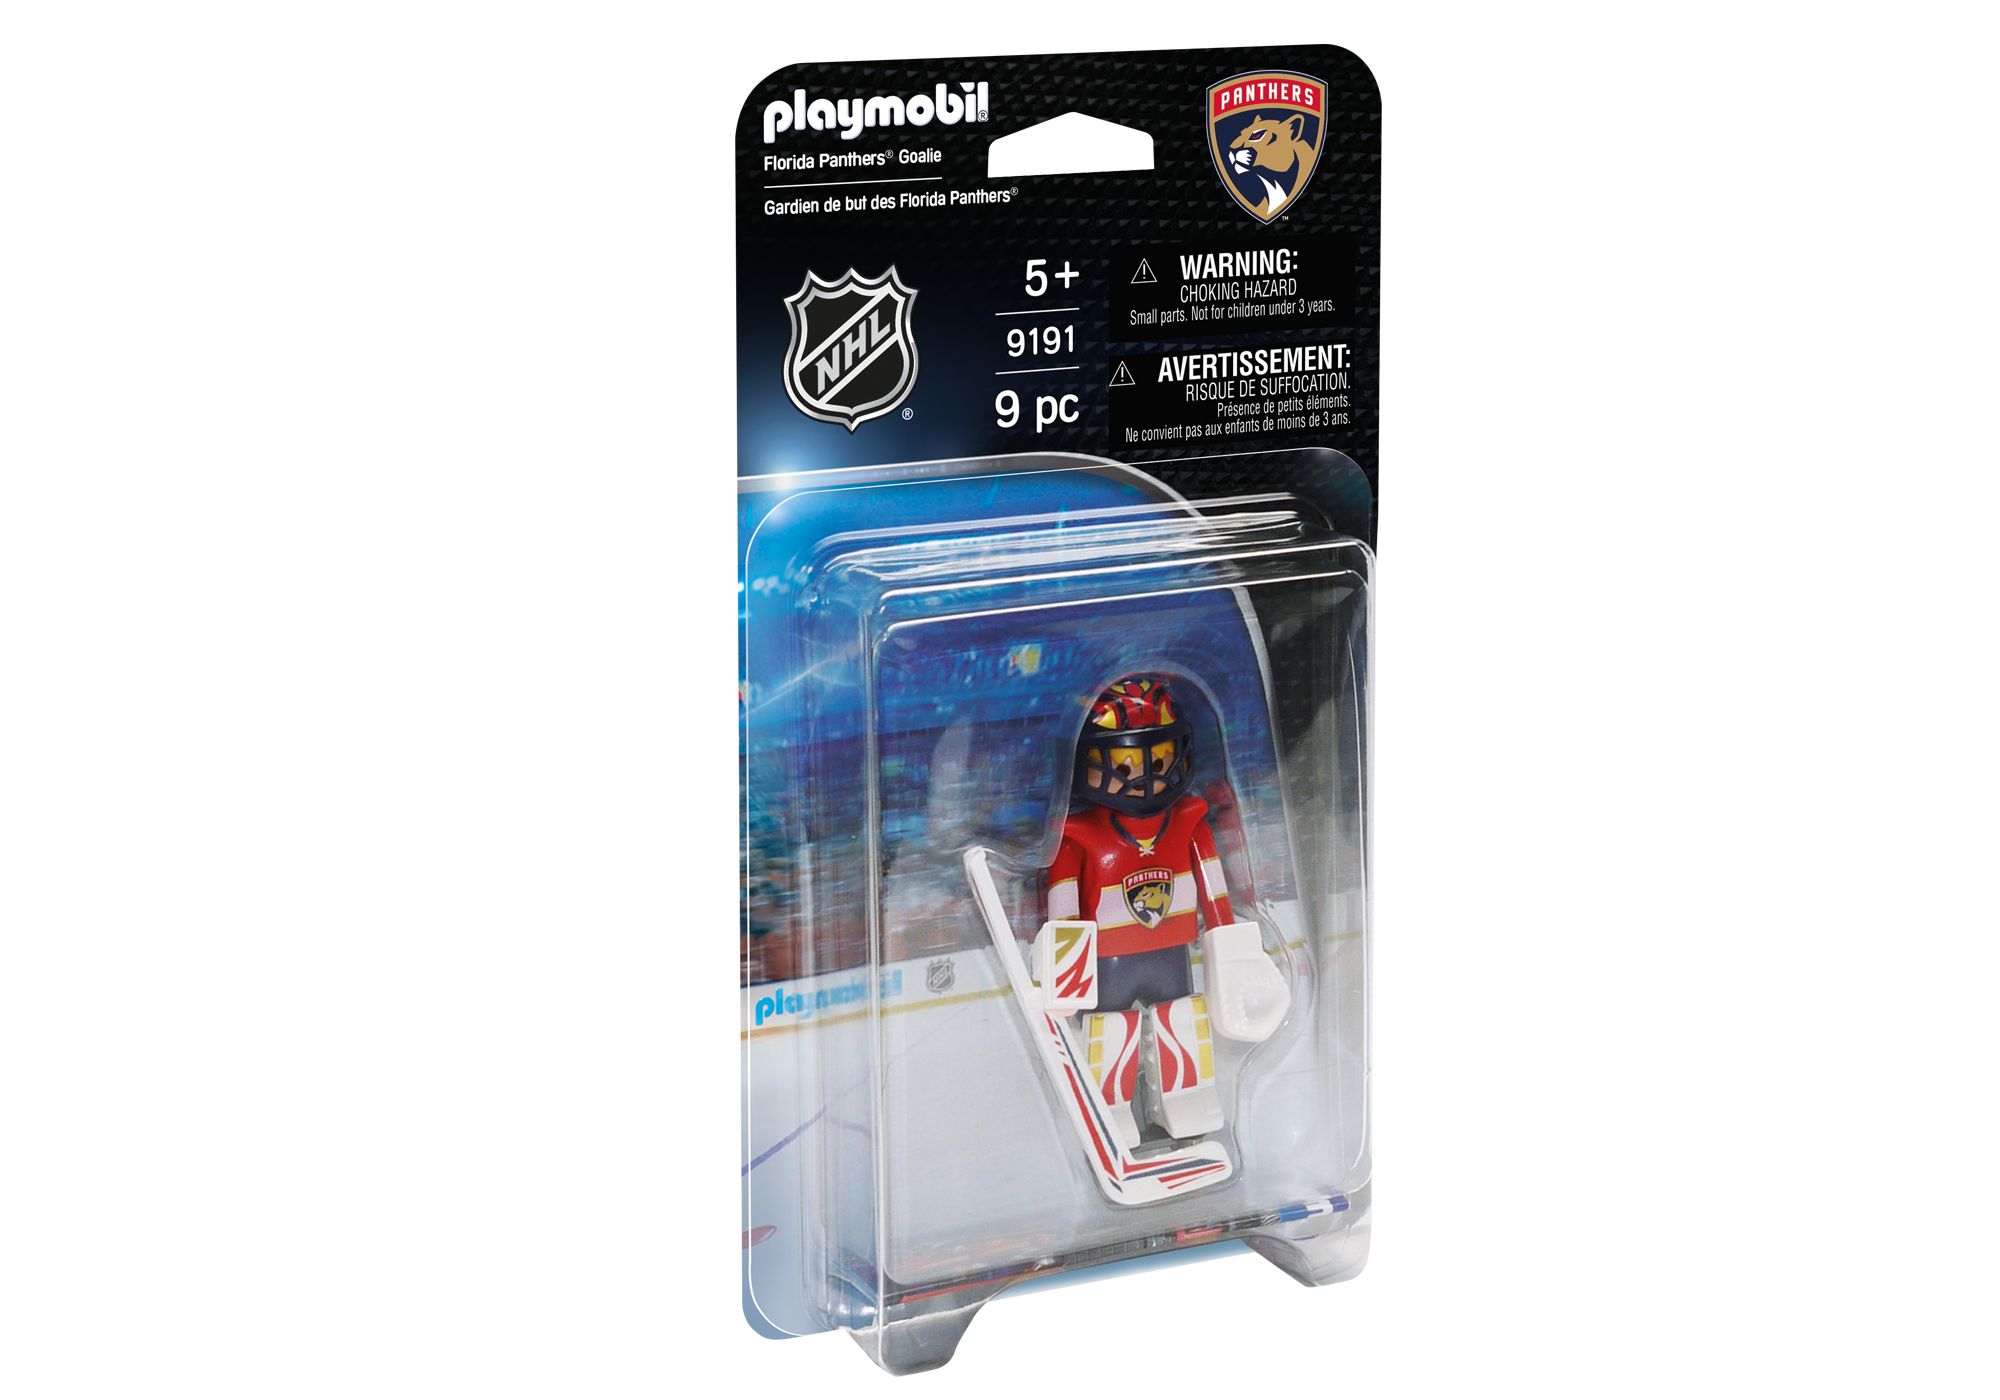 http://media.playmobil.com/i/playmobil/9191_product_box_front/NHL® Florida Panthers® Goalie